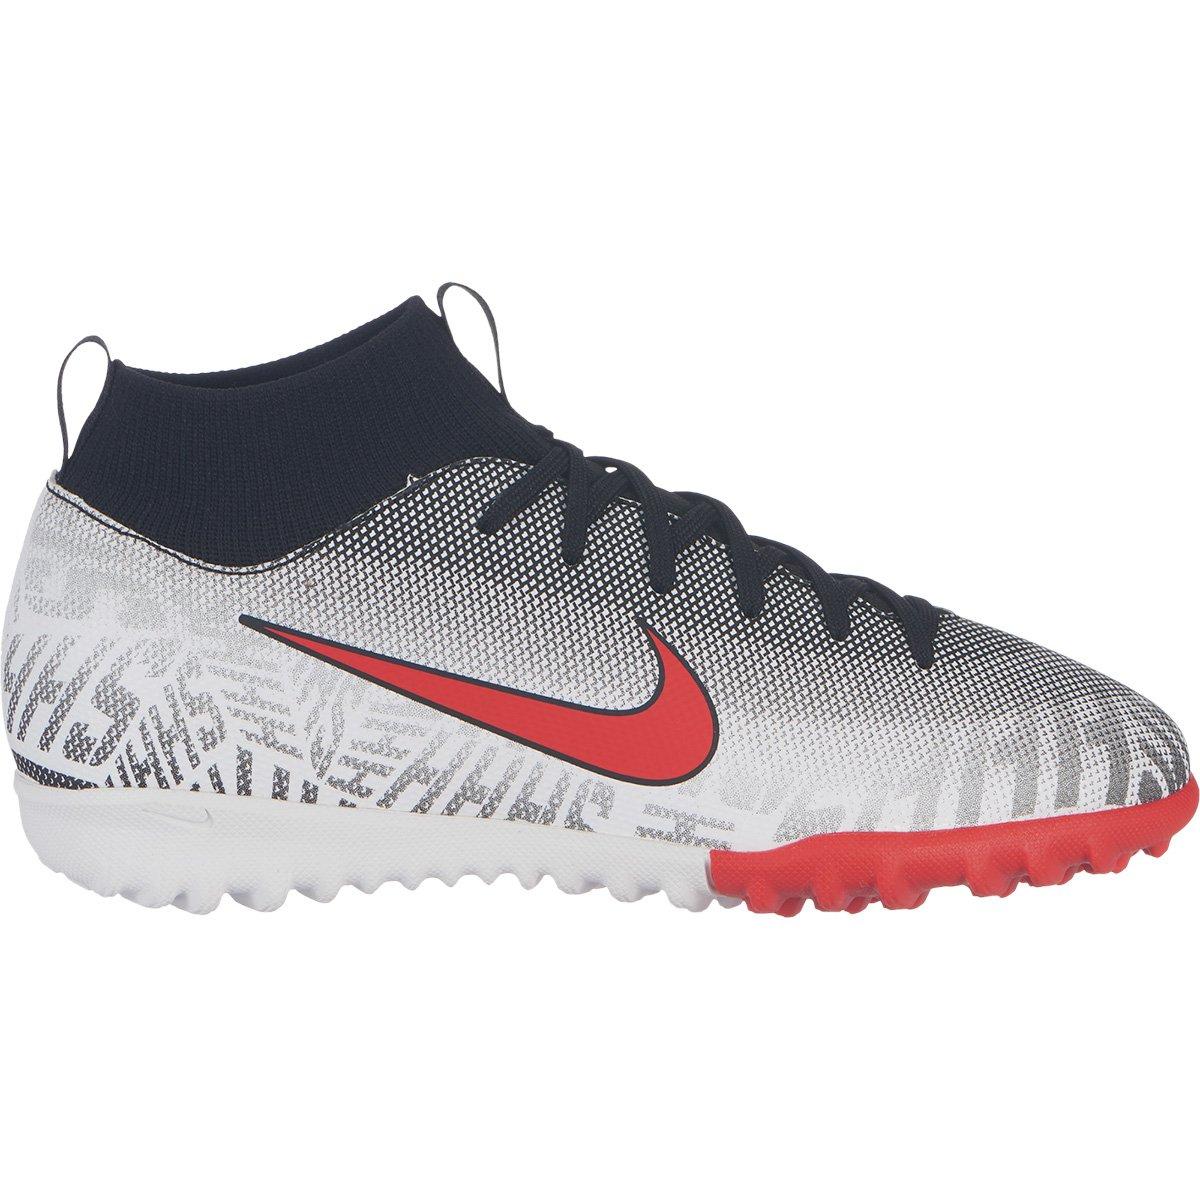 online retailer 60211 cd919 Chuteira Society Infantil Nike Mercurial Superfly 6 Academy Gs Neymar Jr TF  - Branco e Vermelho